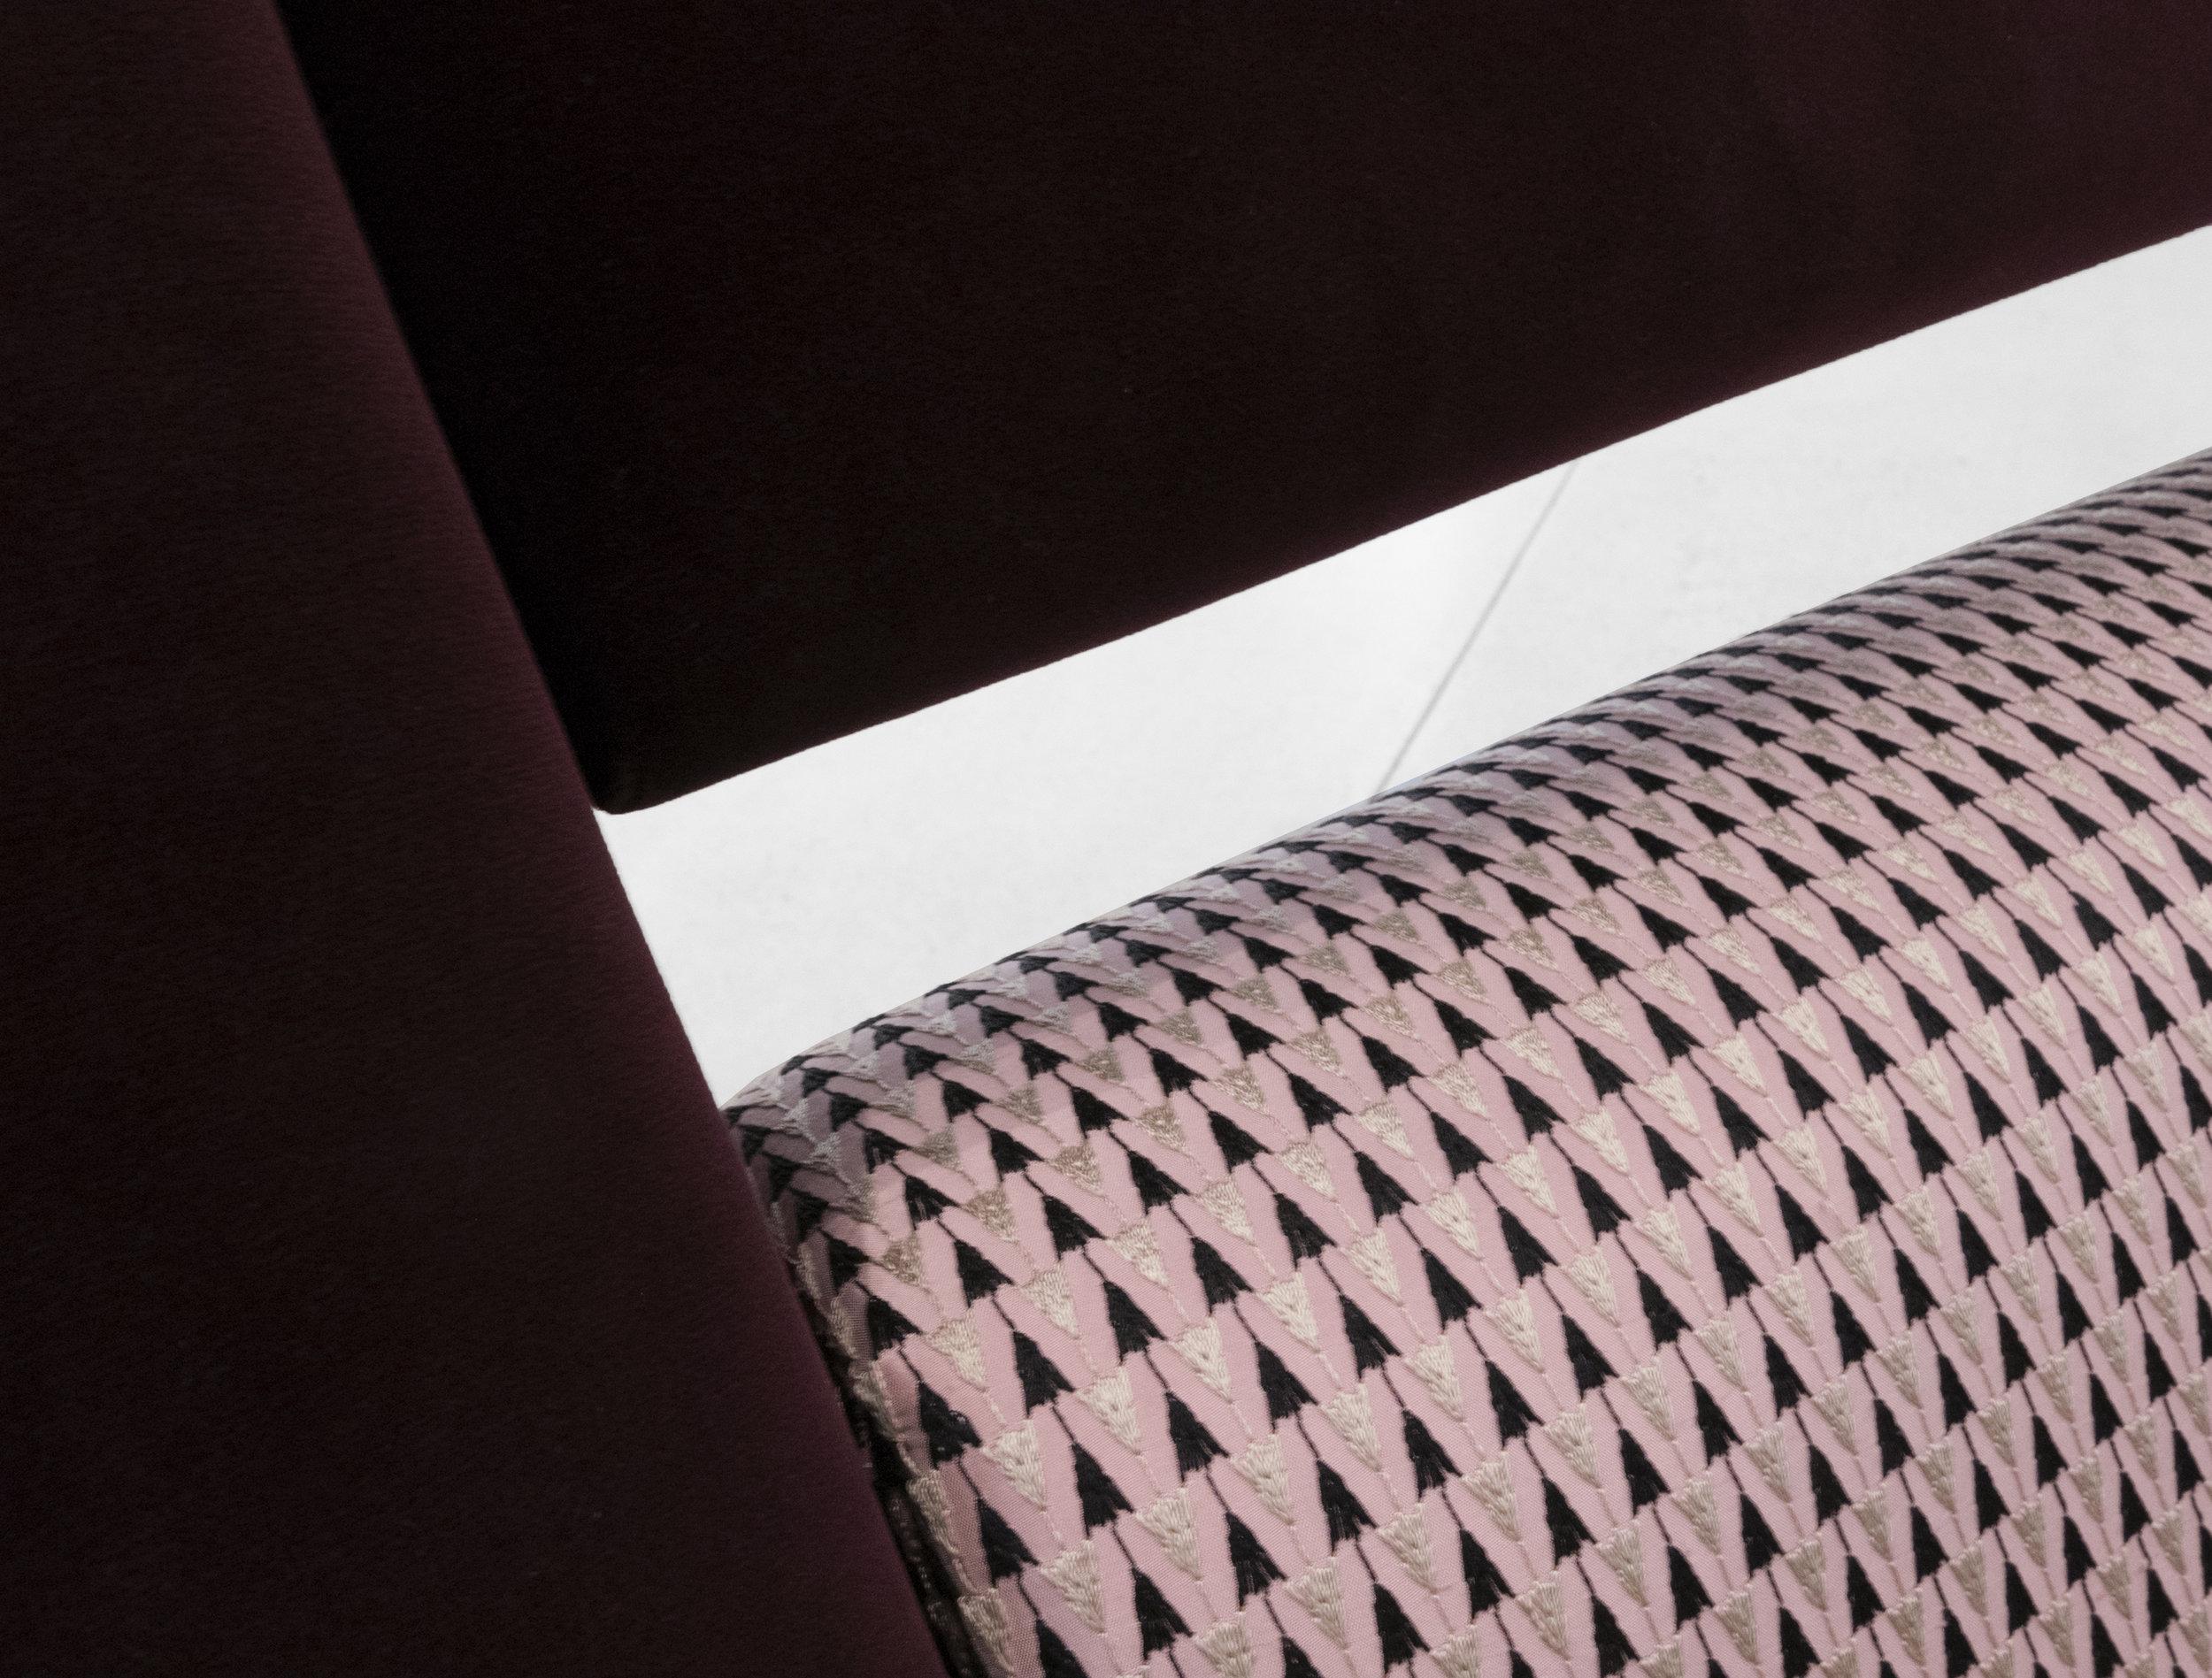 Gigi Radice, Chairs for Minotti, c. 1950 - 1959, Brass, Dedar Milano Upholstery, 31 H x 28 W x 29 D inches_5.jpg